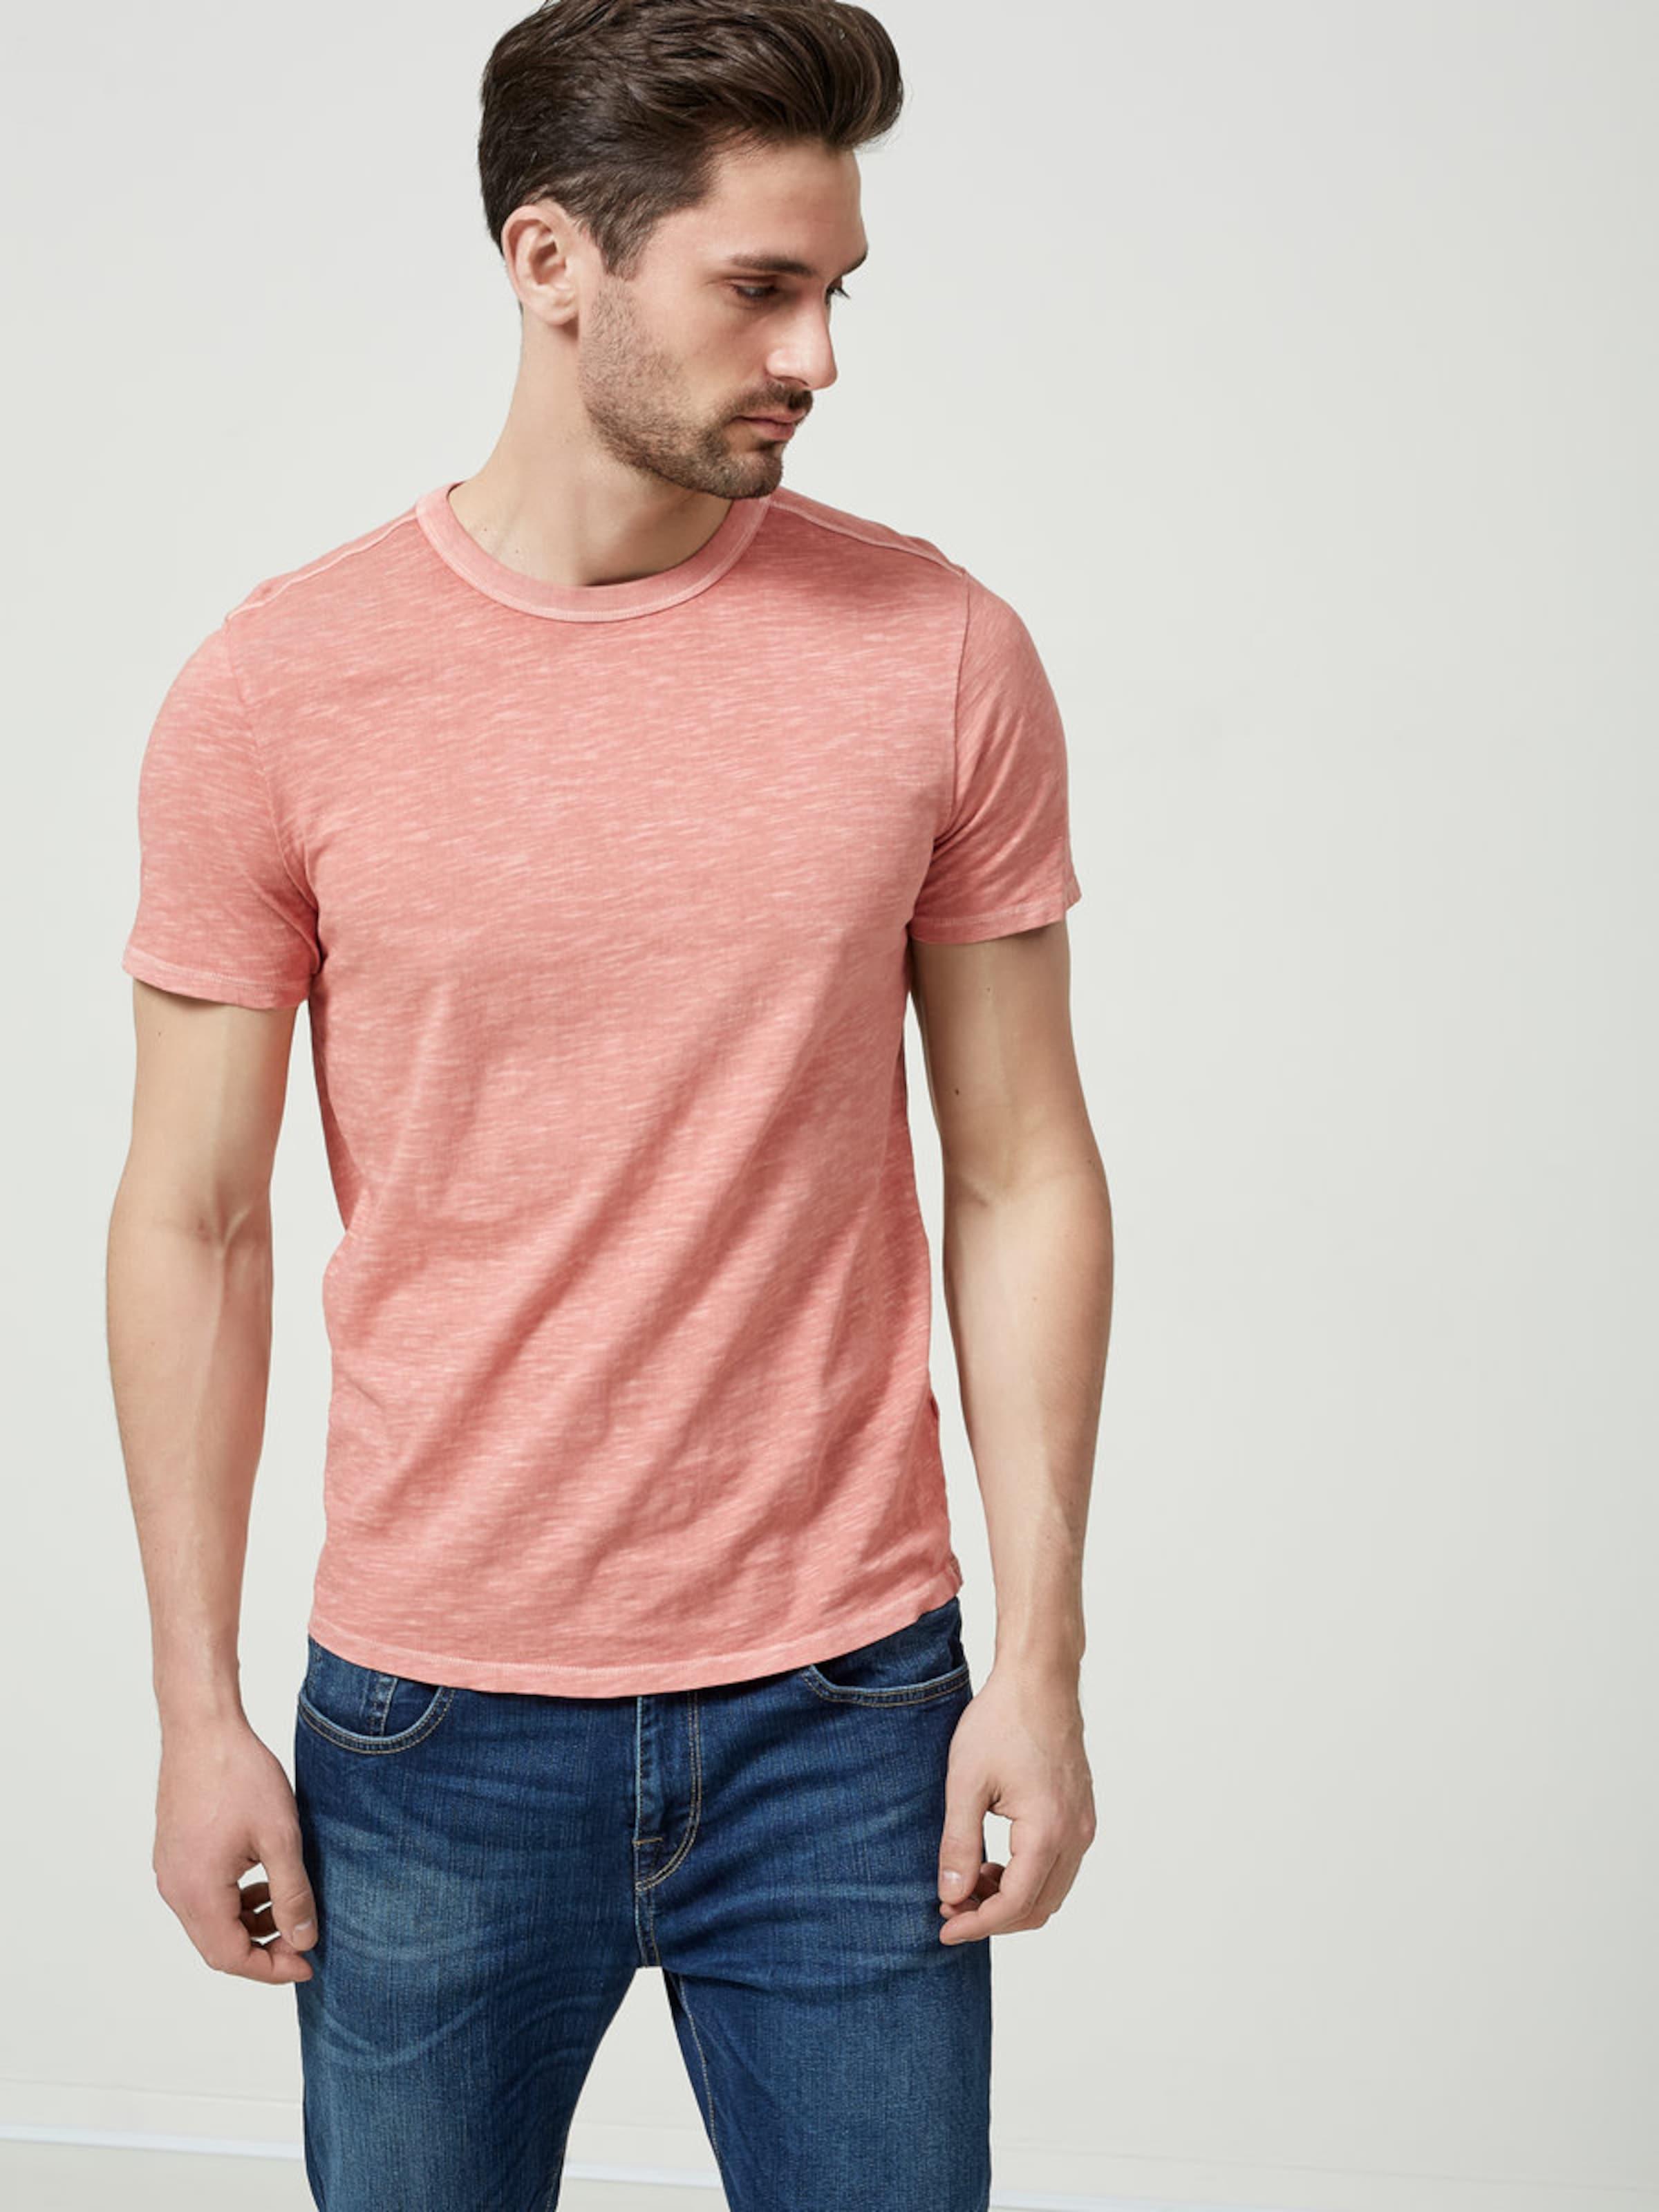 SELECTED HOMME T-Shirt Sauber Und Klassisch SjCqv